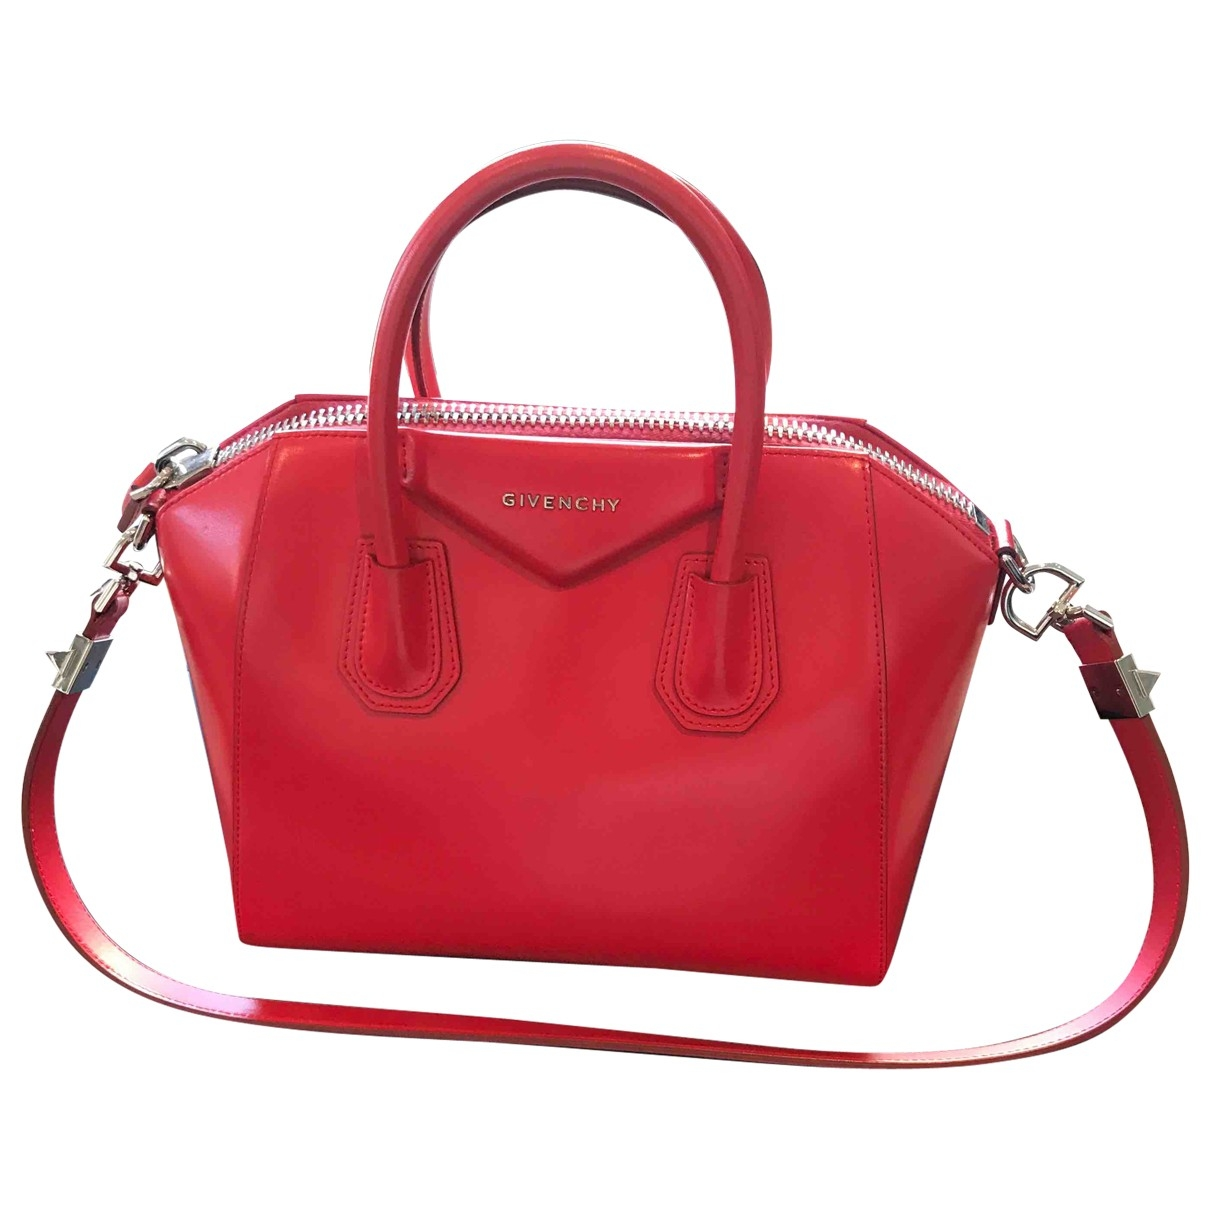 Givenchy - Sac a main Antigona pour femme en cuir - rouge